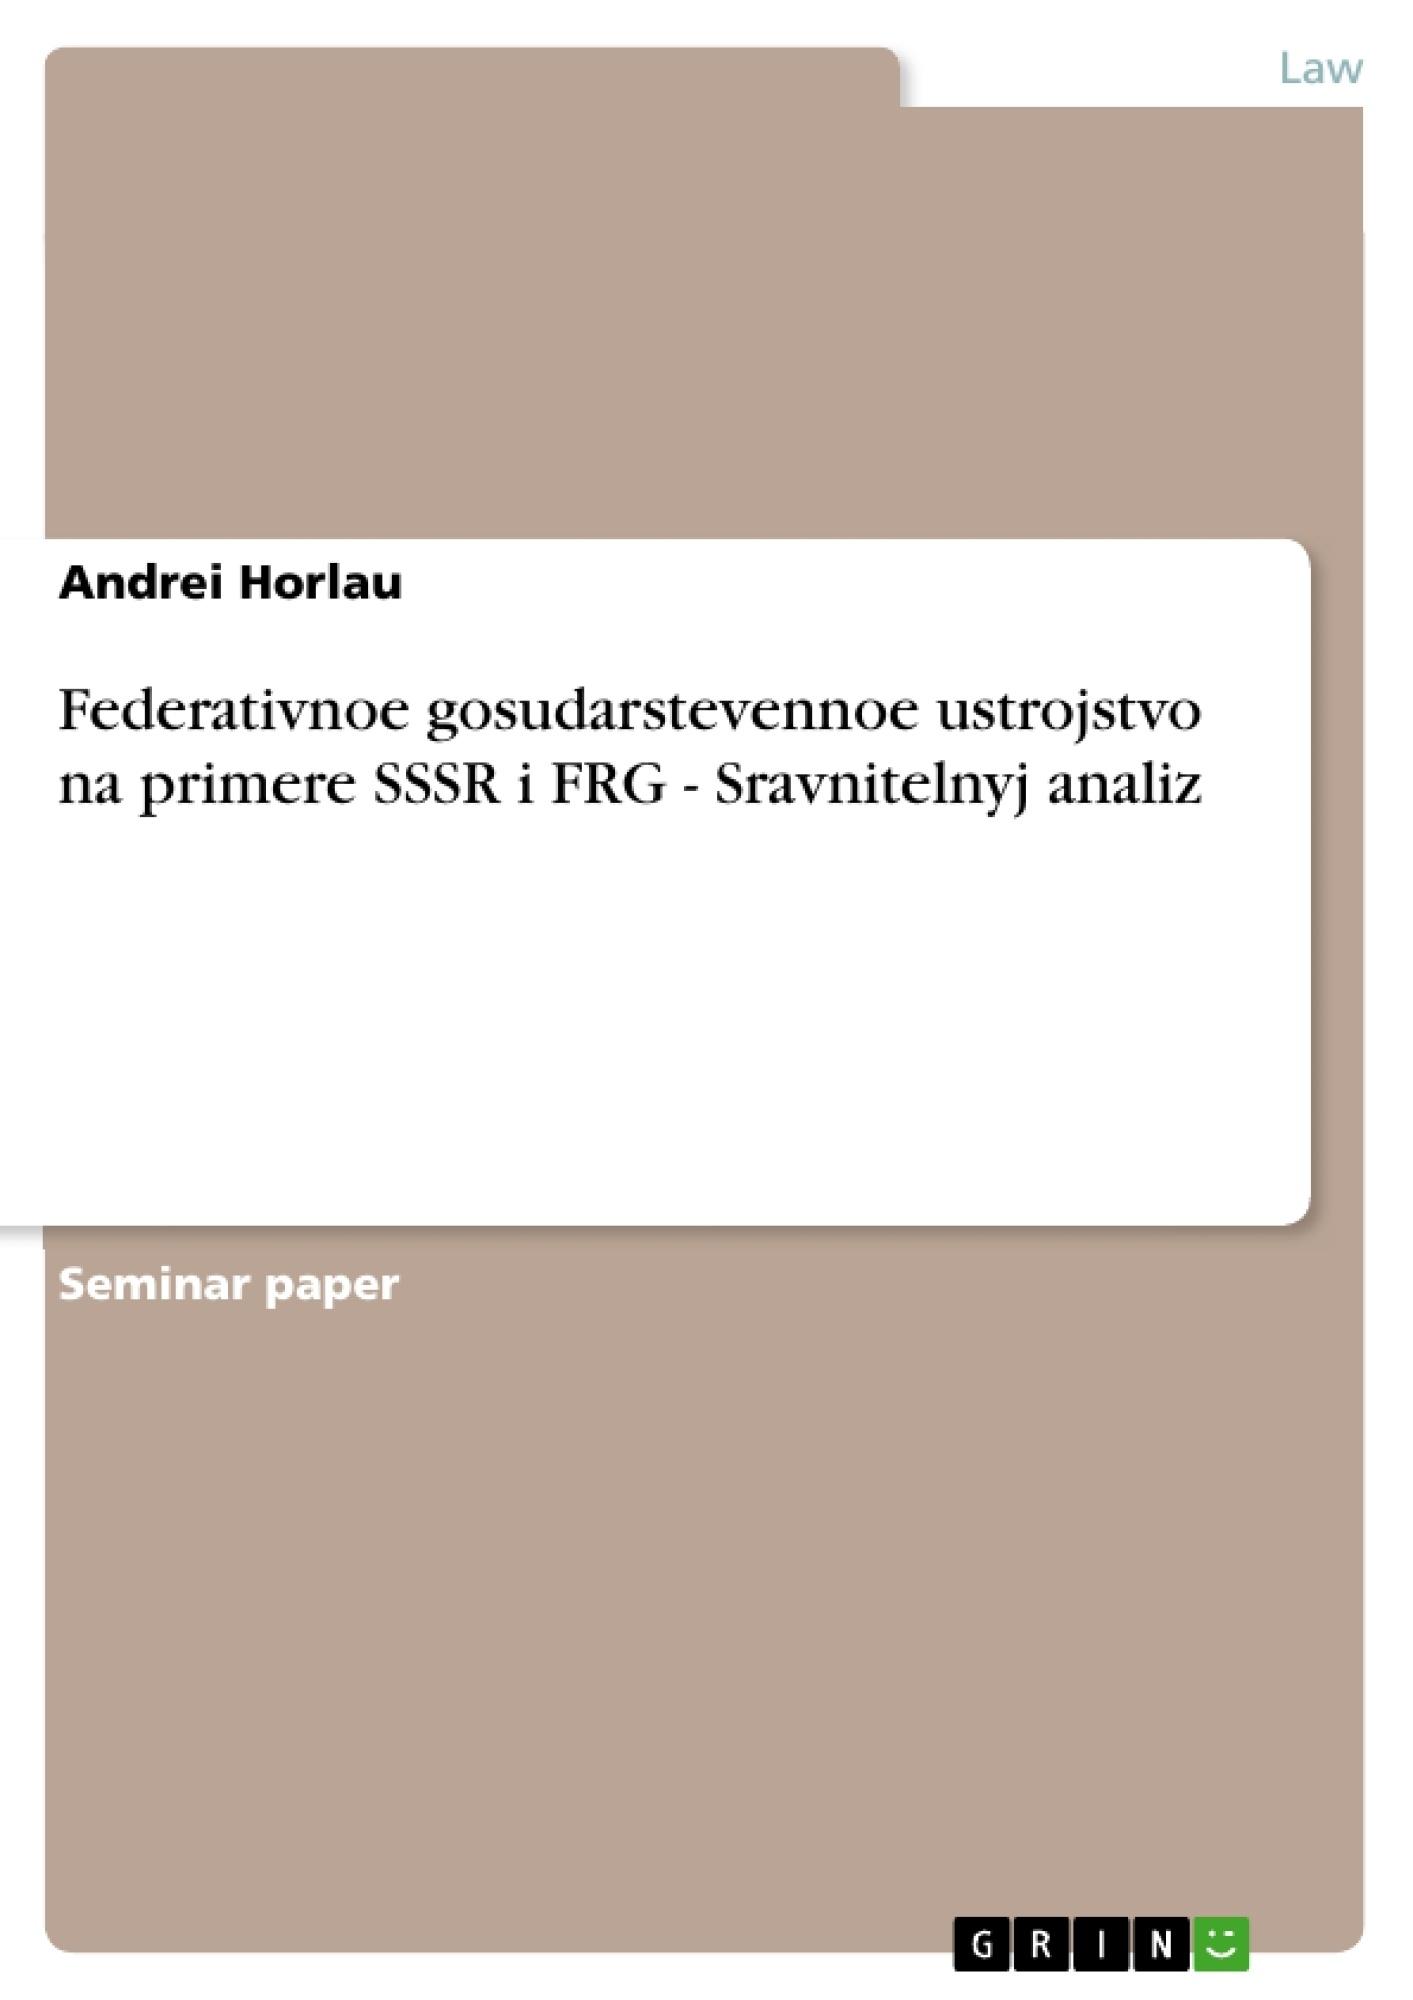 Title: Federativnoe gosudarstevennoe ustrojstvo na primere SSSR i FRG - Sravnitelnyj analiz